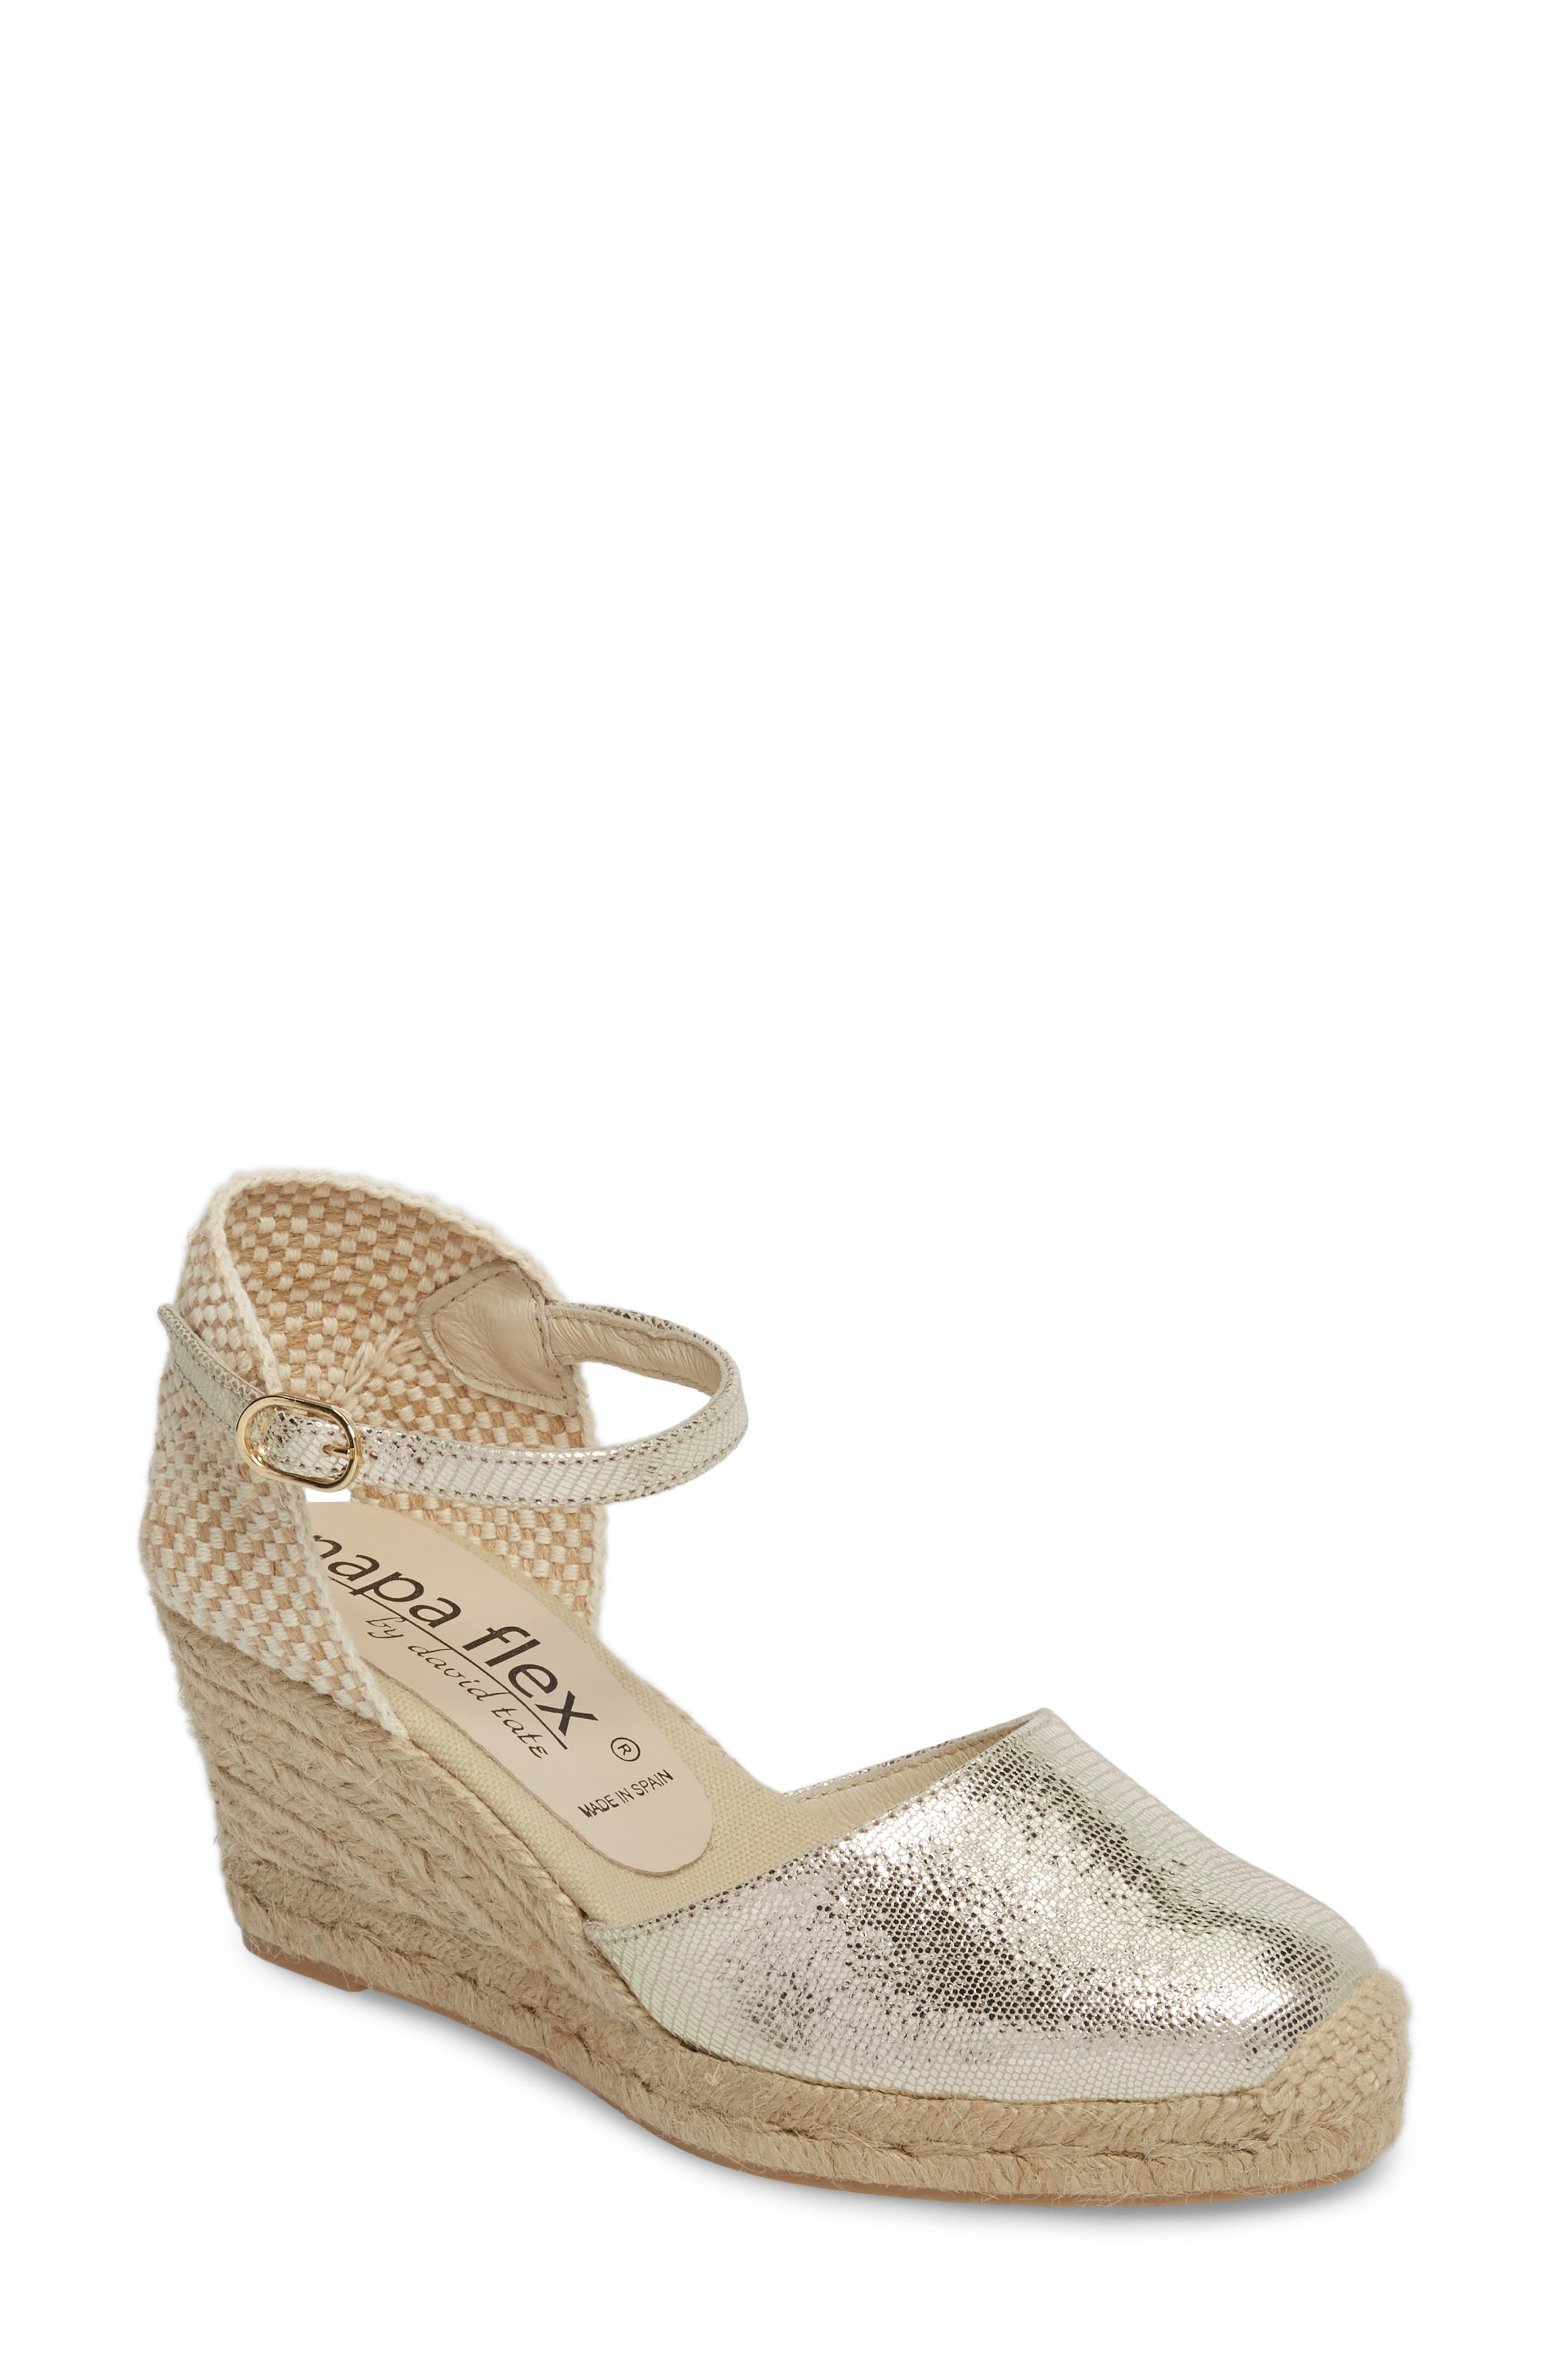 Napa Flex Europa Wedge Sandal (Women)